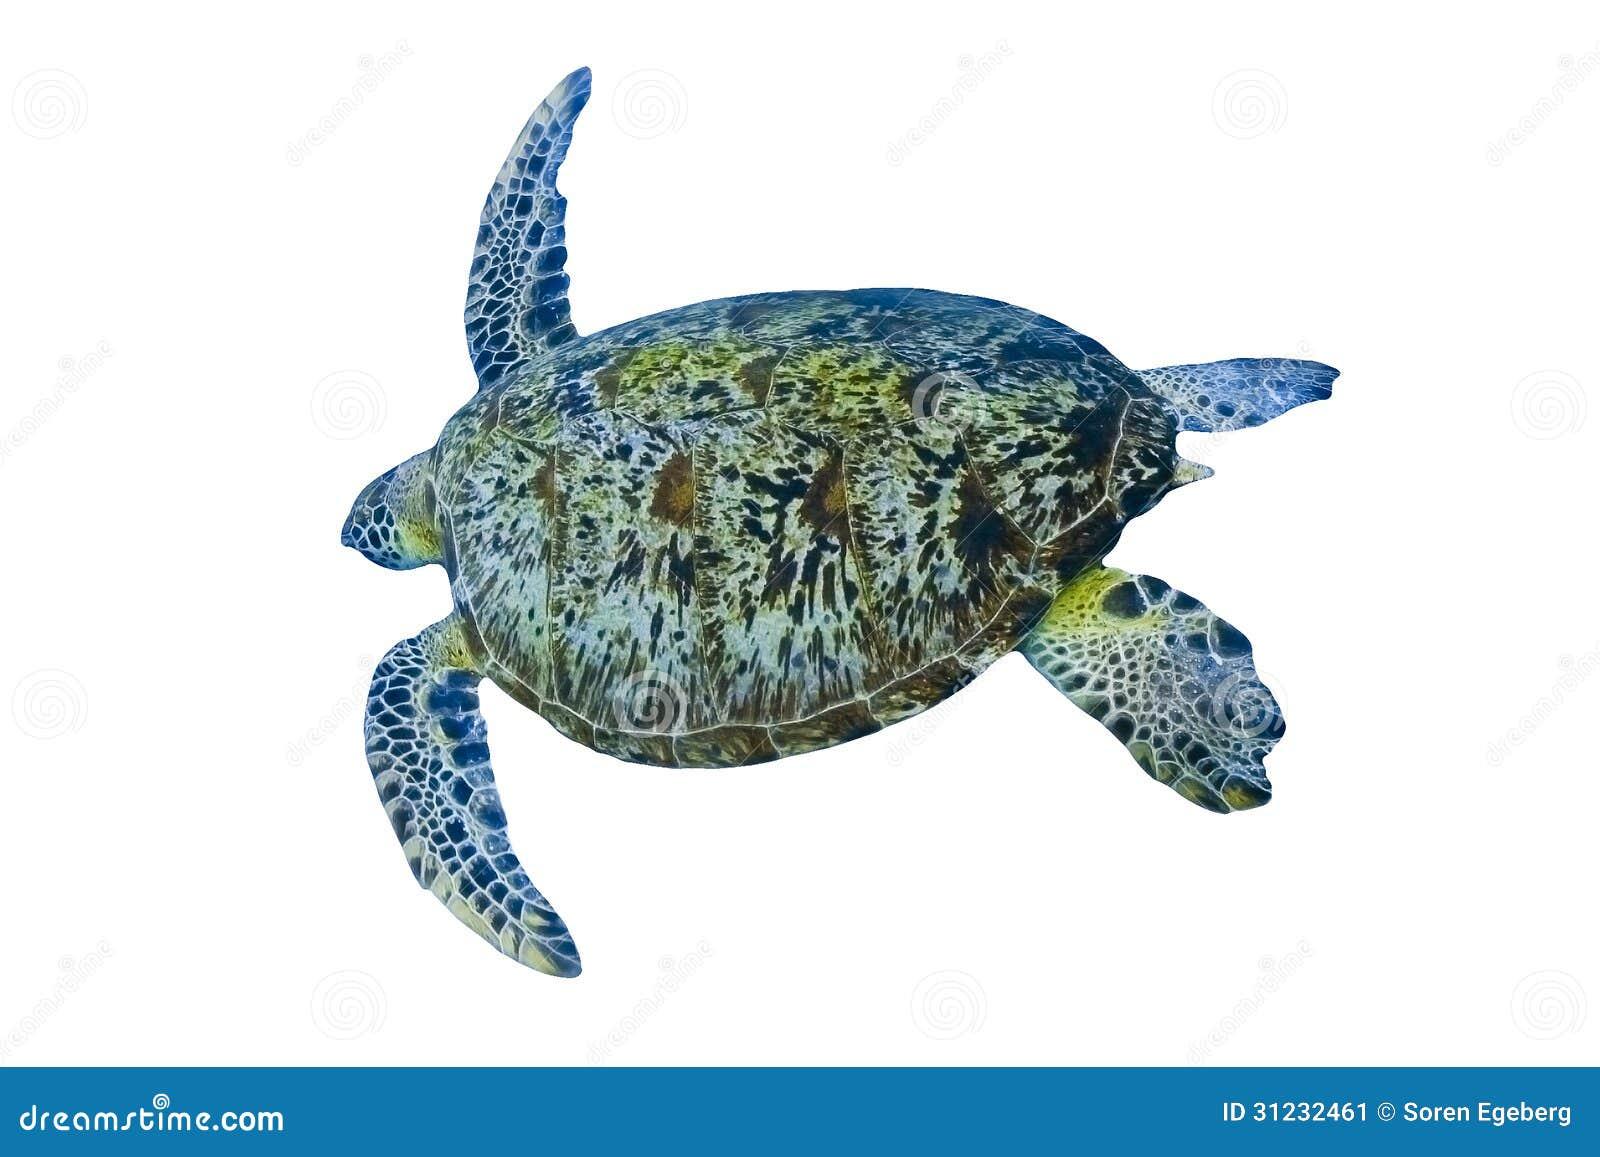 turtle white background - photo #37